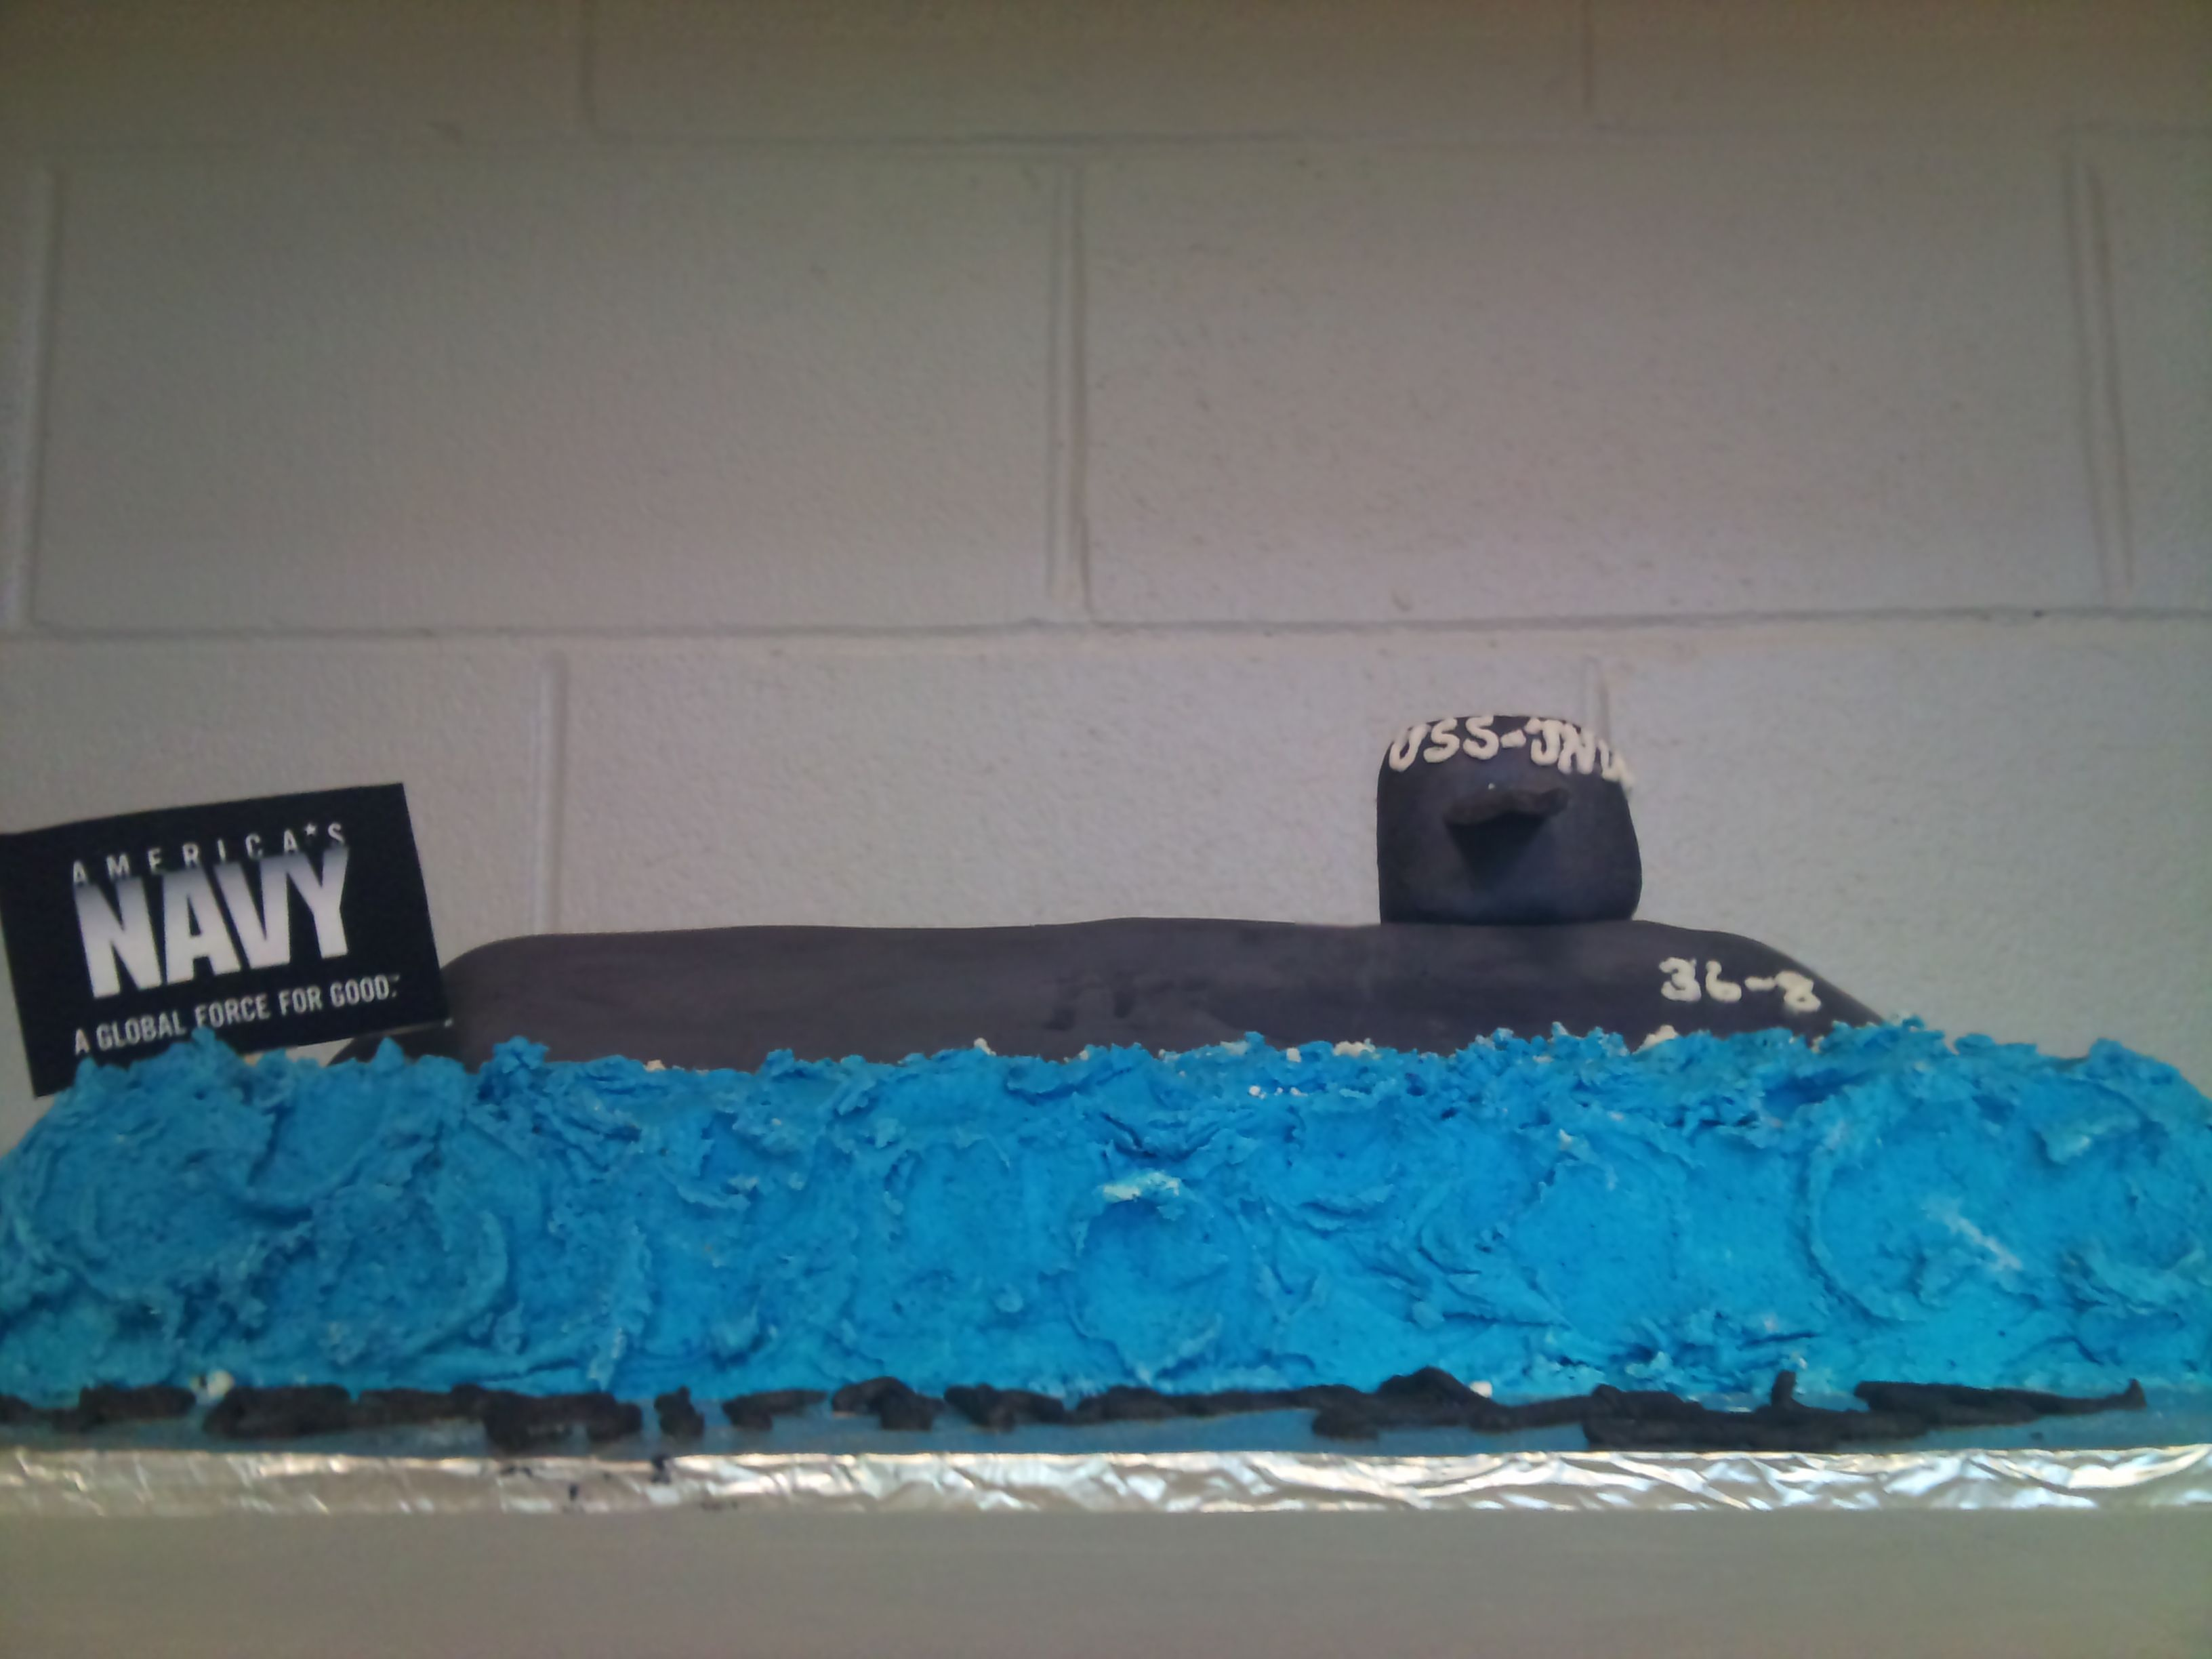 Fantastic Submarine Birthday Cake For Navy Birthday Party At The Funny Birthday Cards Online Inifodamsfinfo